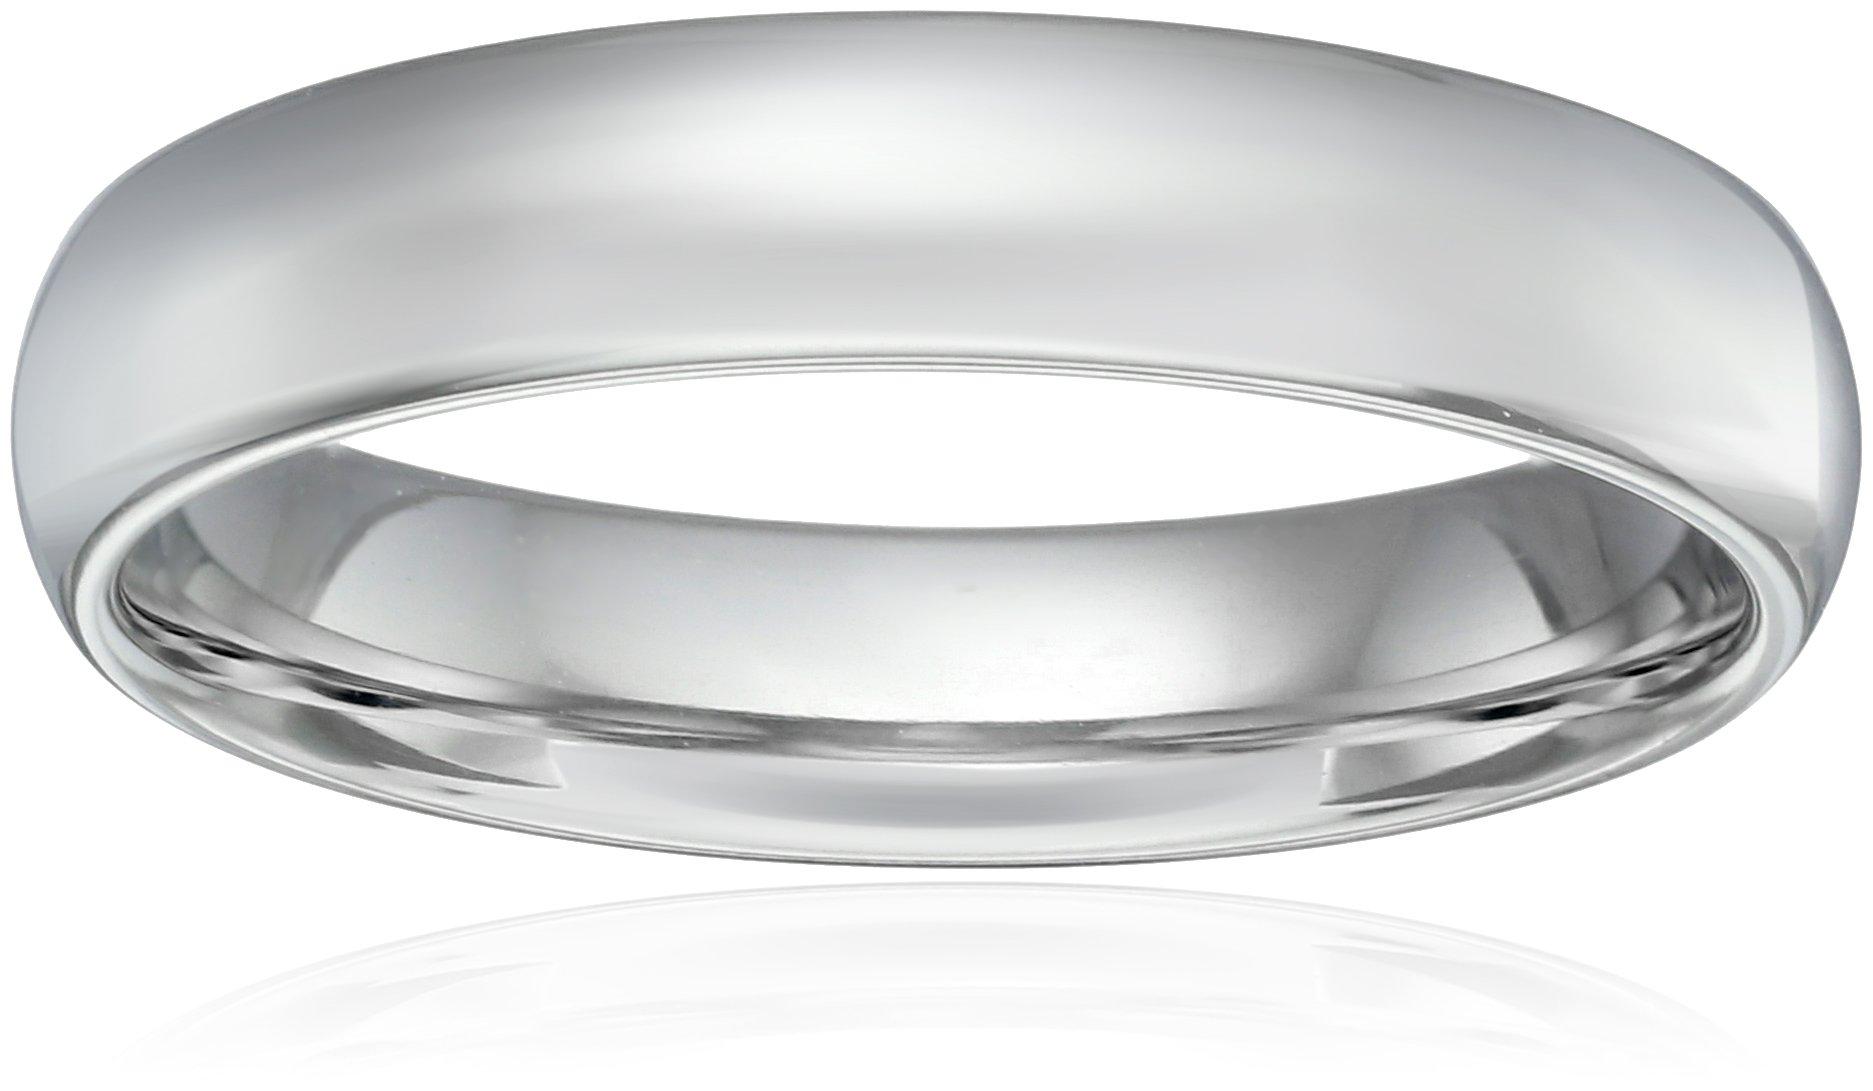 Standard Comfort-Fit Platinum Band, 5mm, Size 9.5